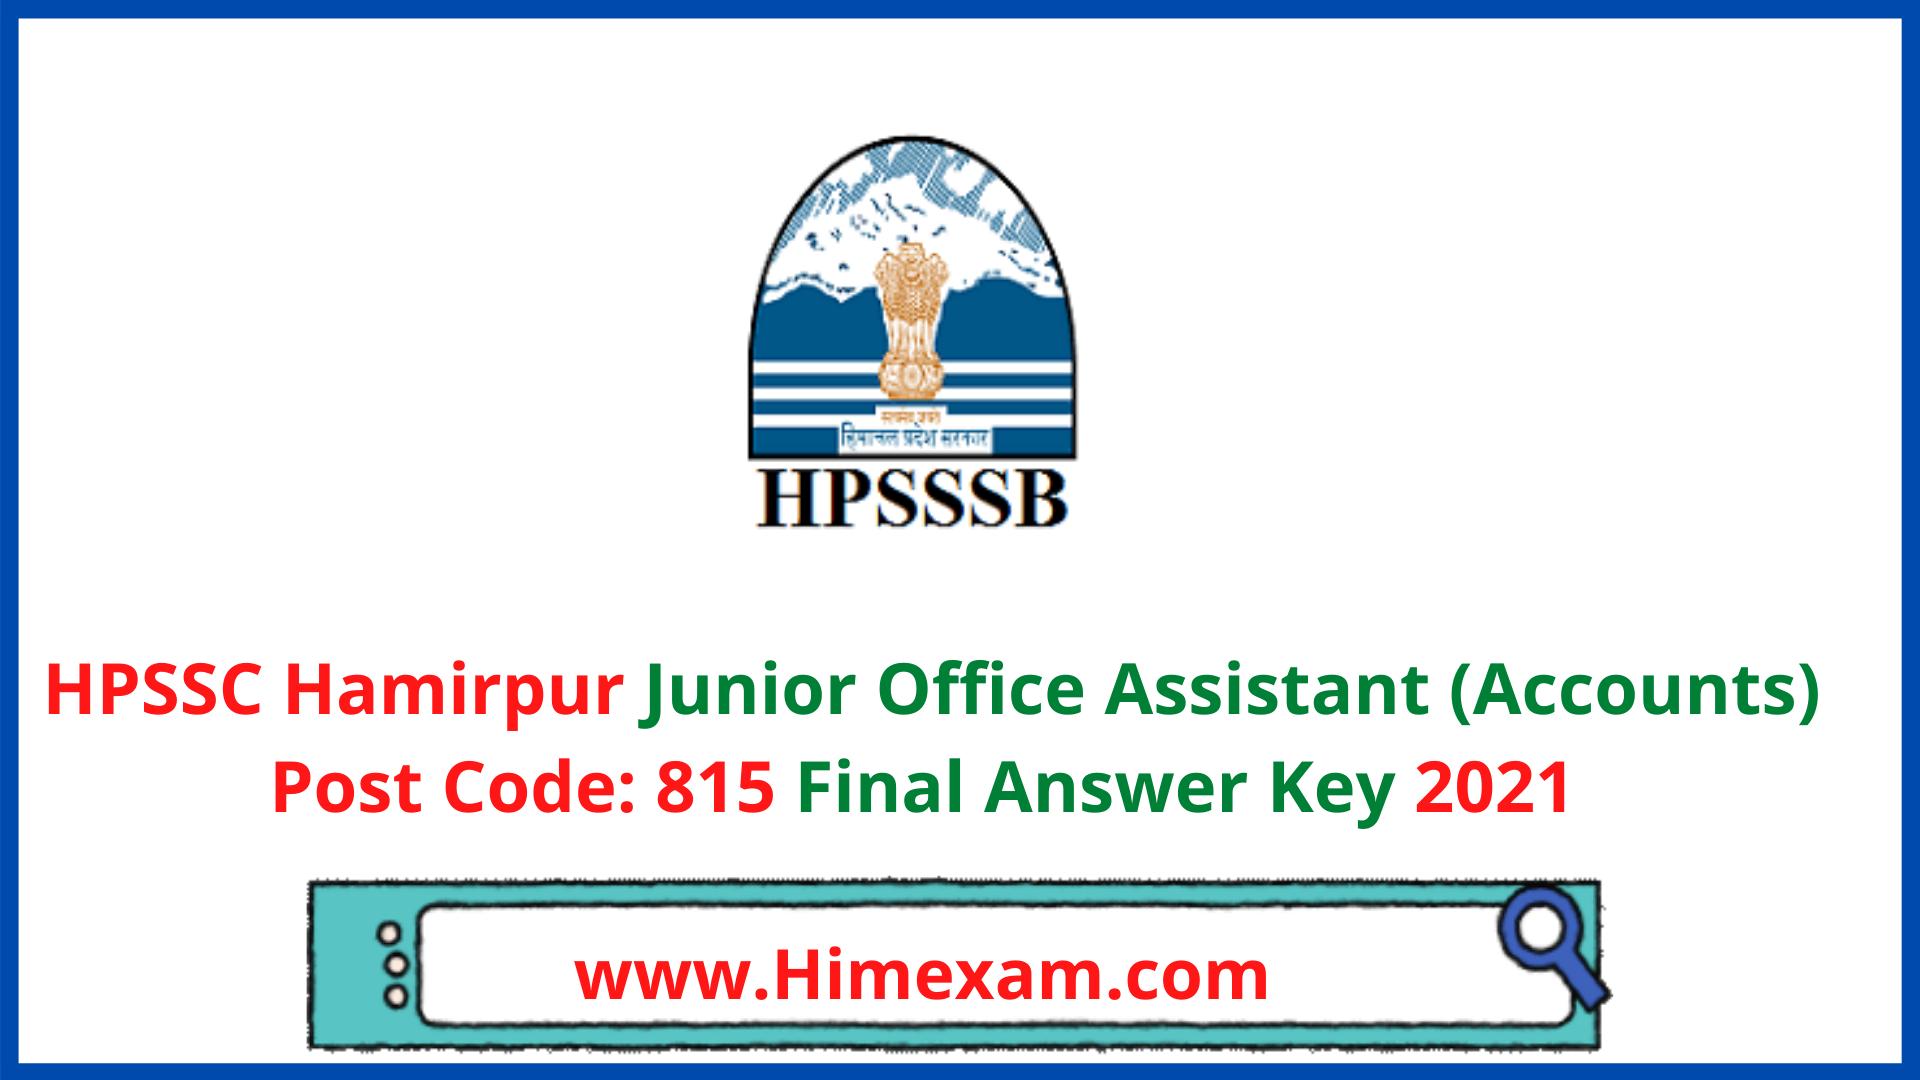 HPSSC JOA Accounts Post Code 815 Final Answer Key 2021